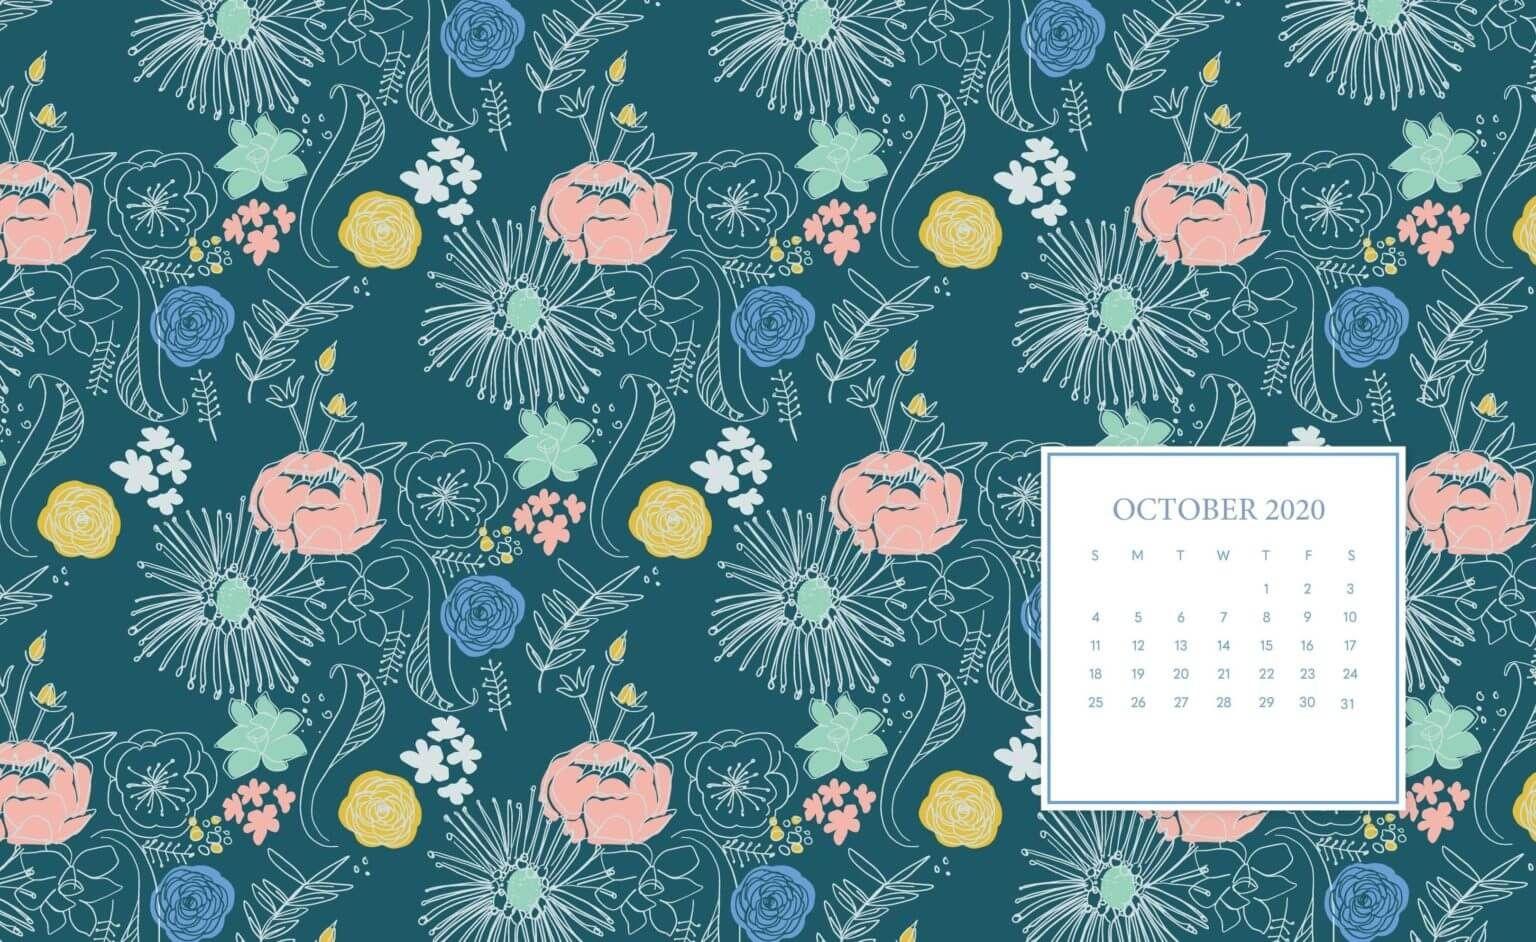 October 2020 Desktop Calendar Wallpaper In 2020 Calendar Wallpaper October Wallpaper Desktop Wallpaper Calendar